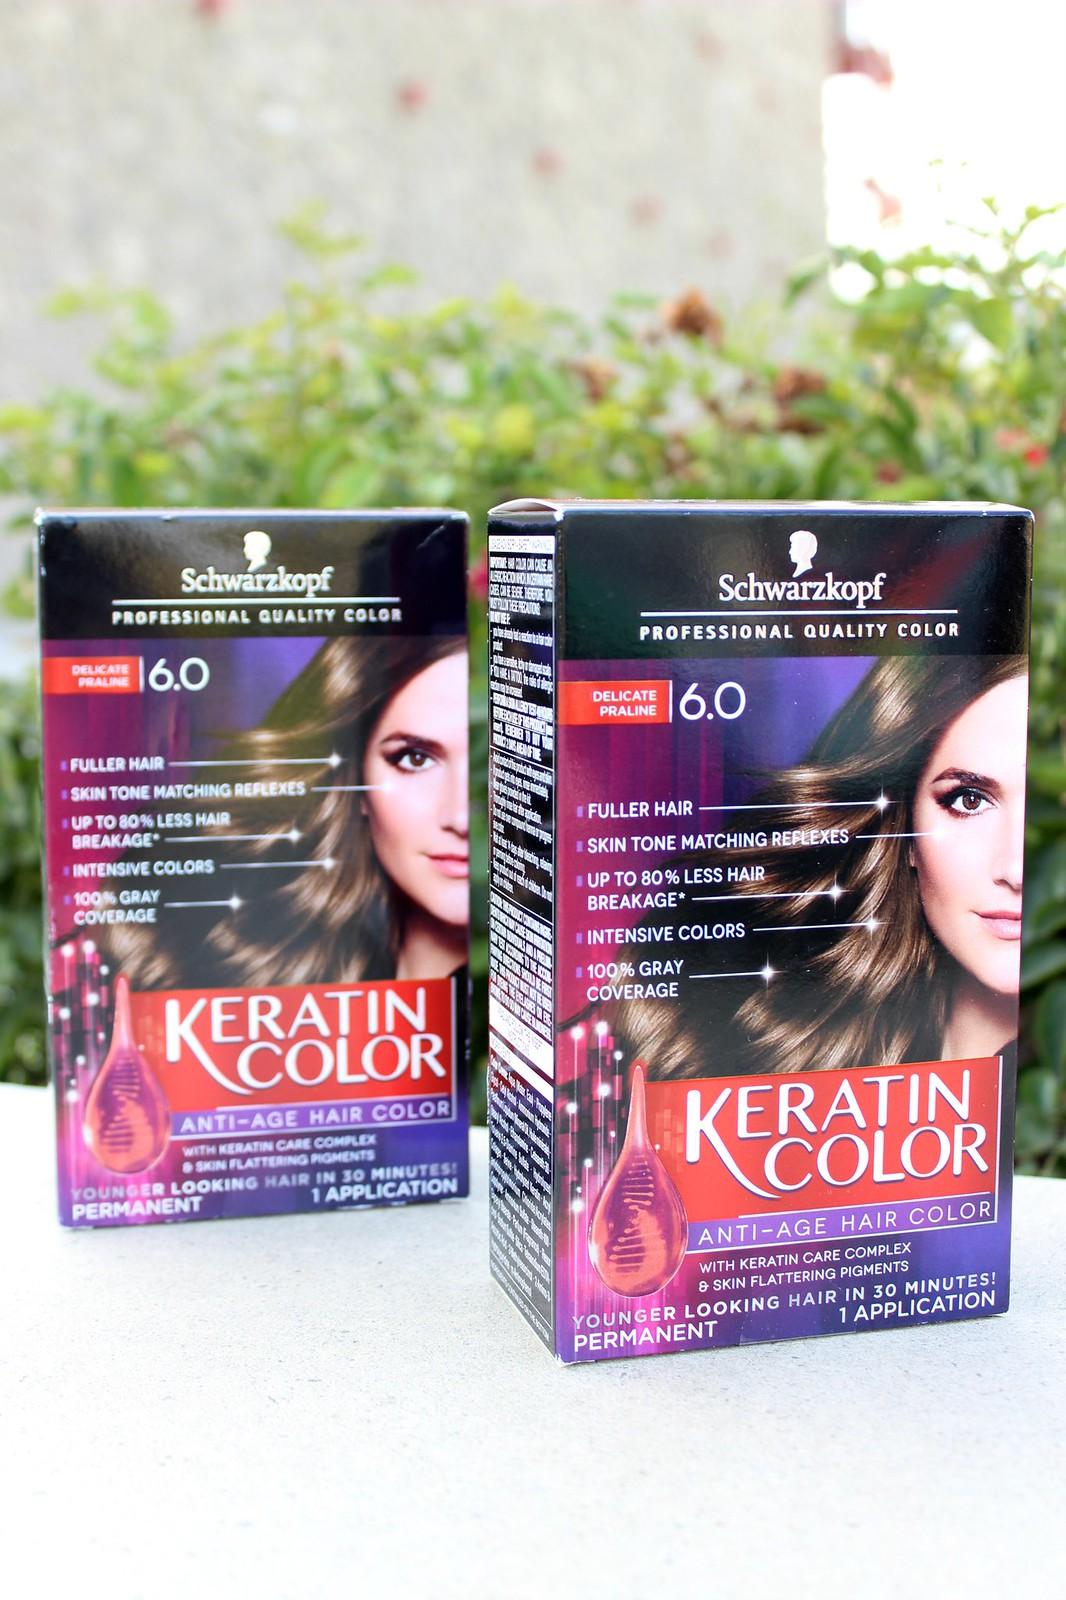 Schwarzkopf Keratin Color #KeratinColor #KeratinCares